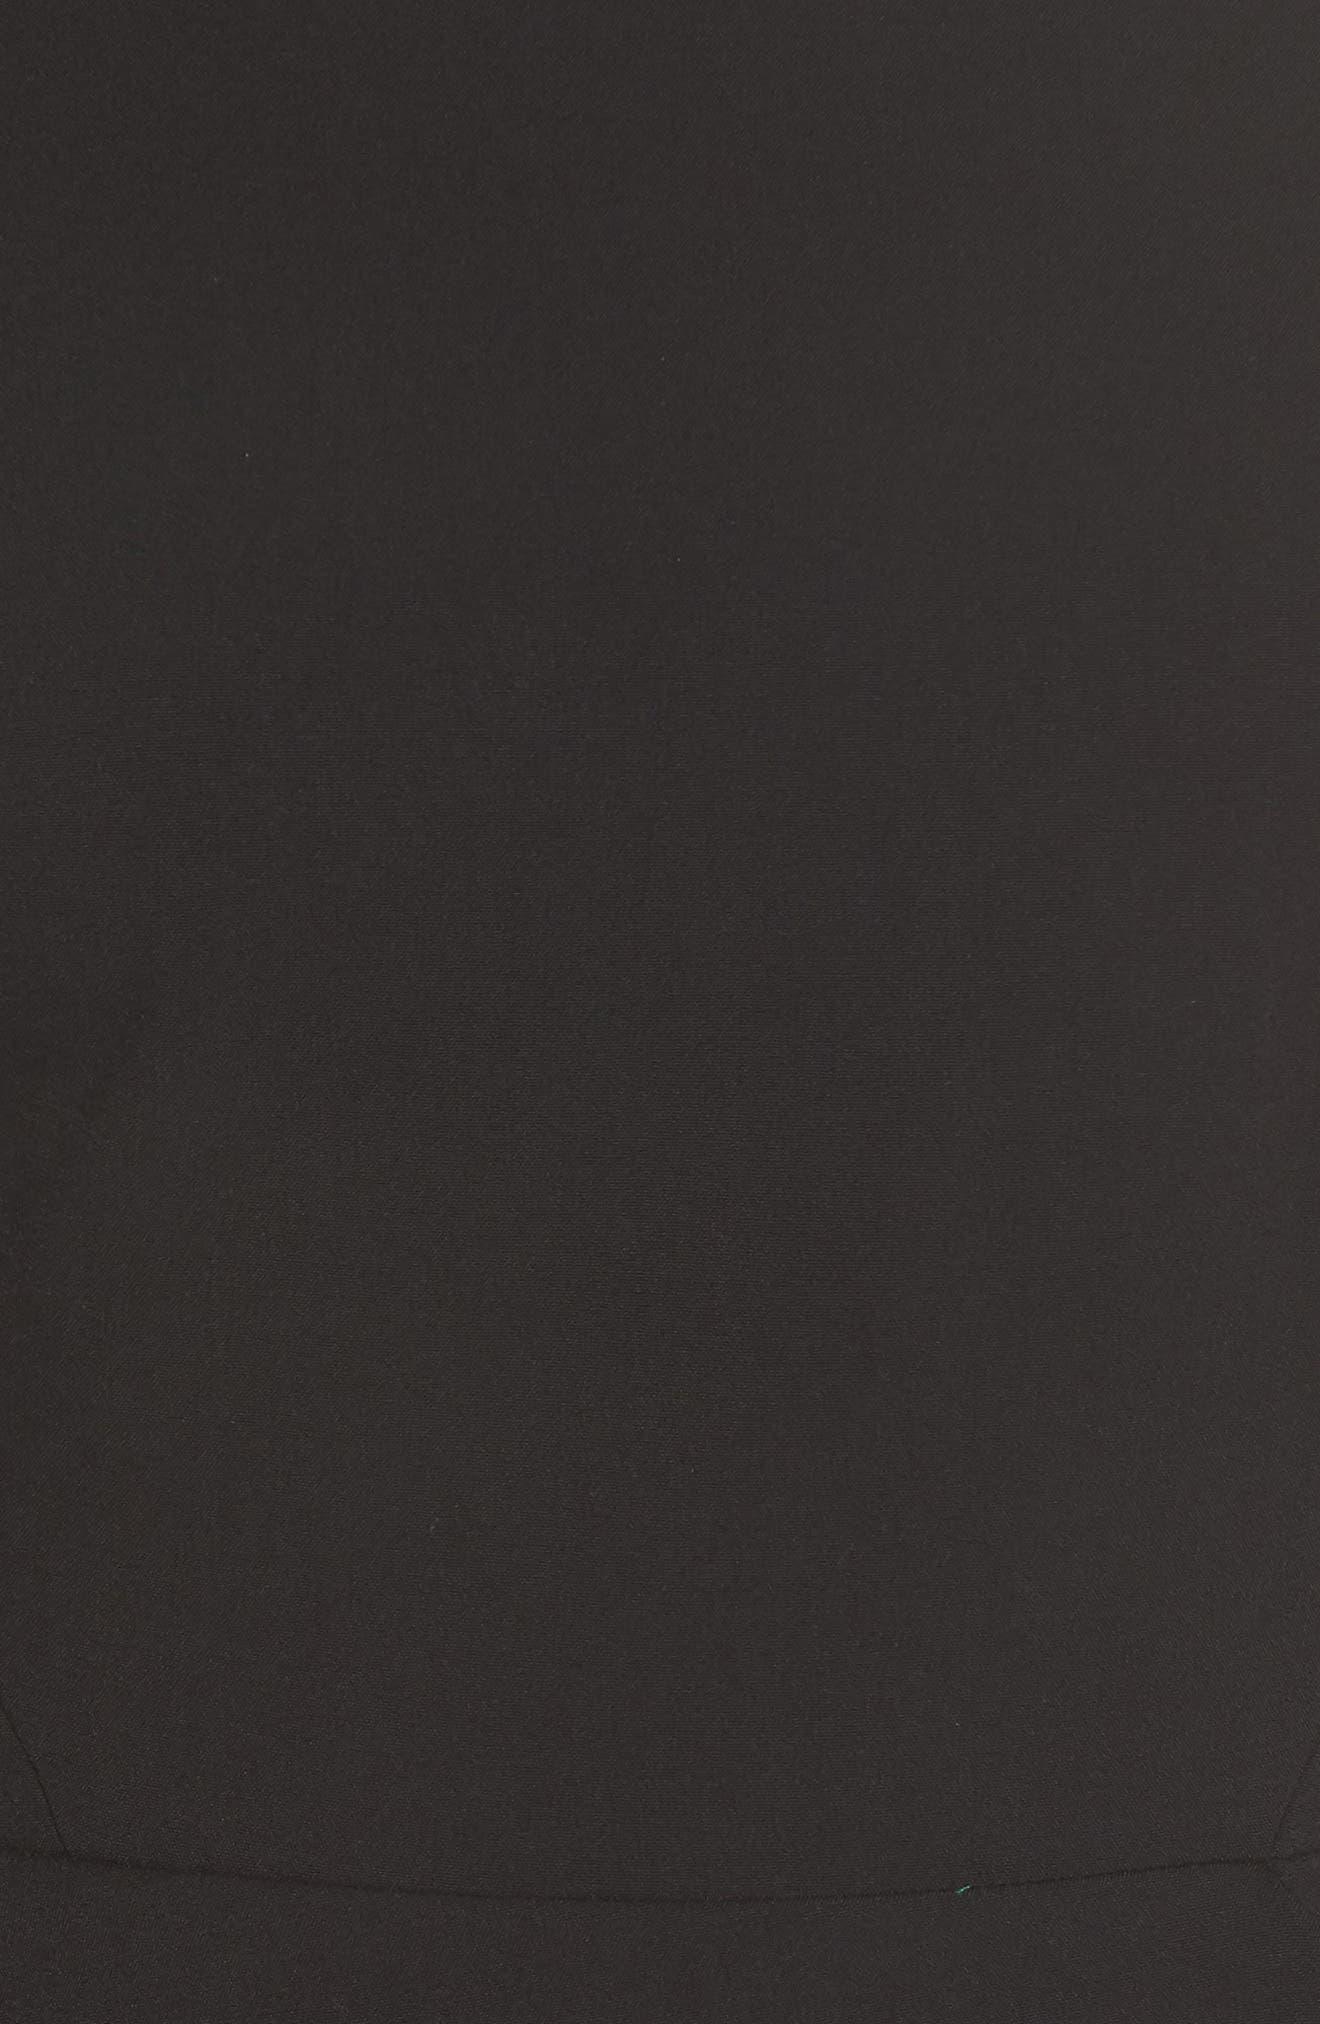 VINCE CAMUTO,                             Angled Ruffle Sheath Dress,                             Alternate thumbnail 6, color,                             BLACK